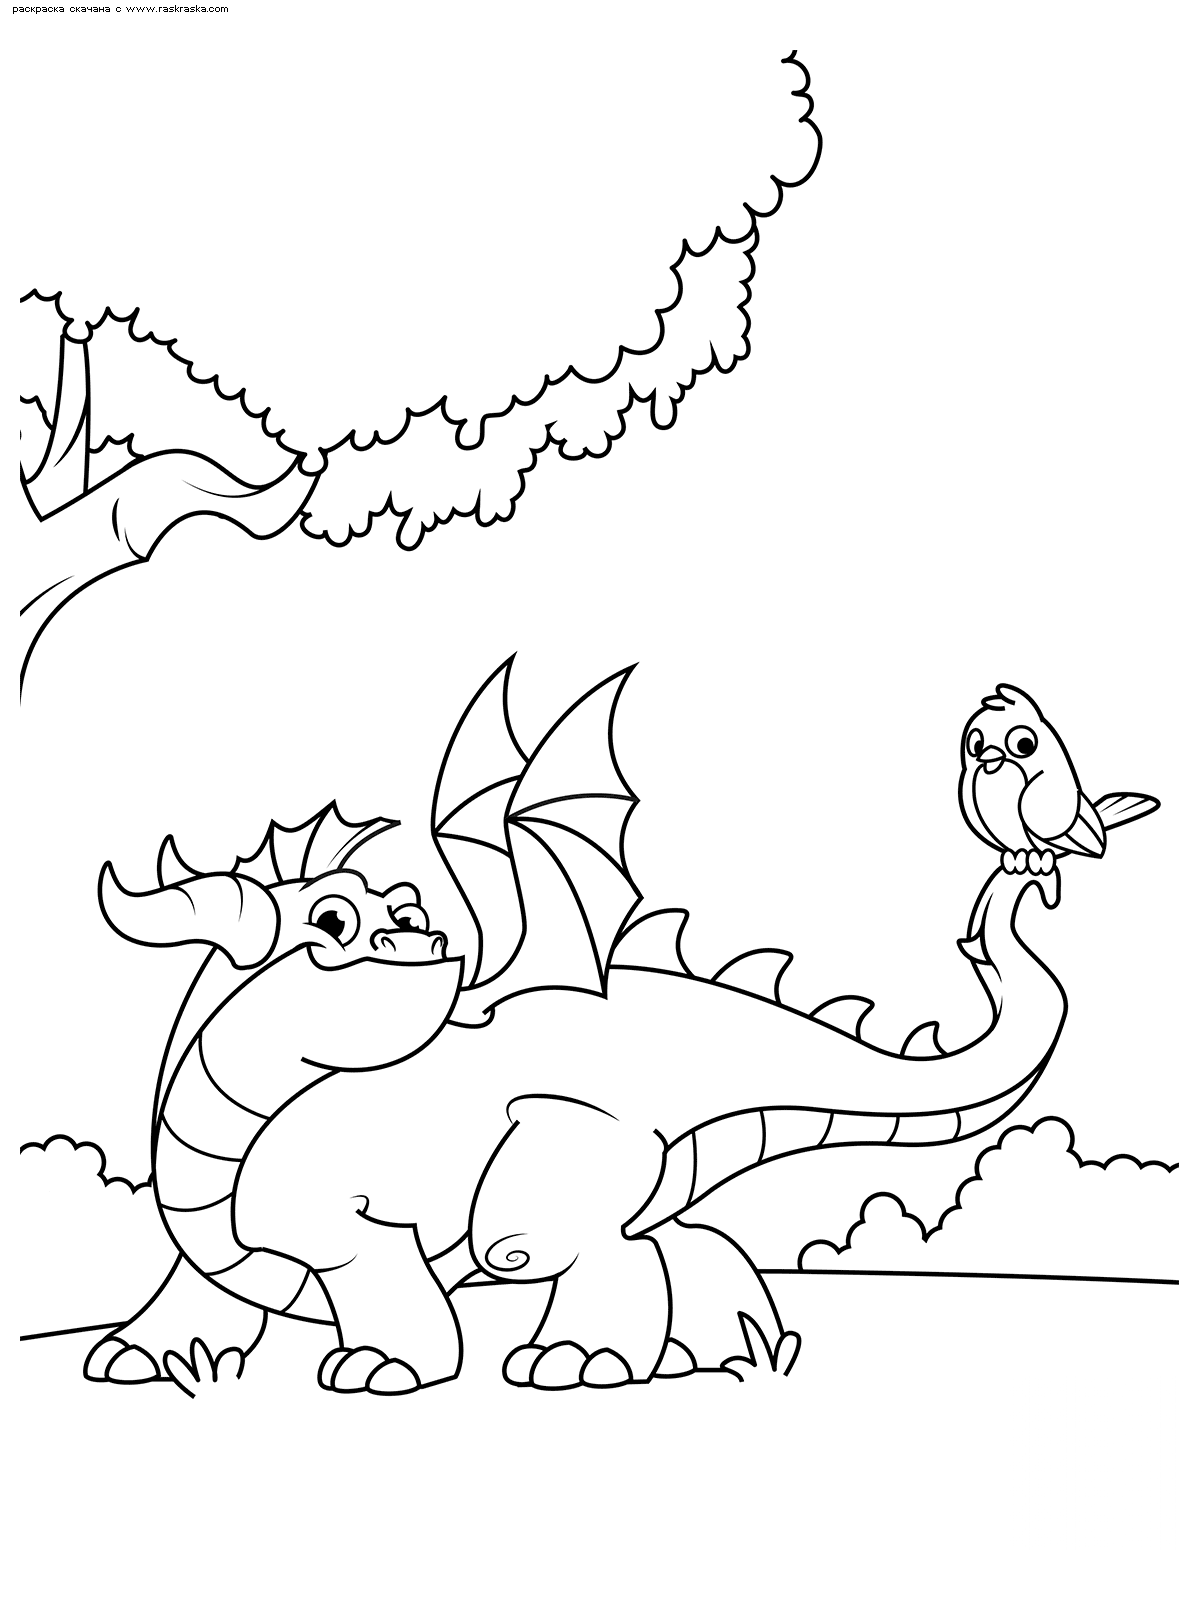 Раскраска Дракон на прогулке | Раскраски с дракончиками ...